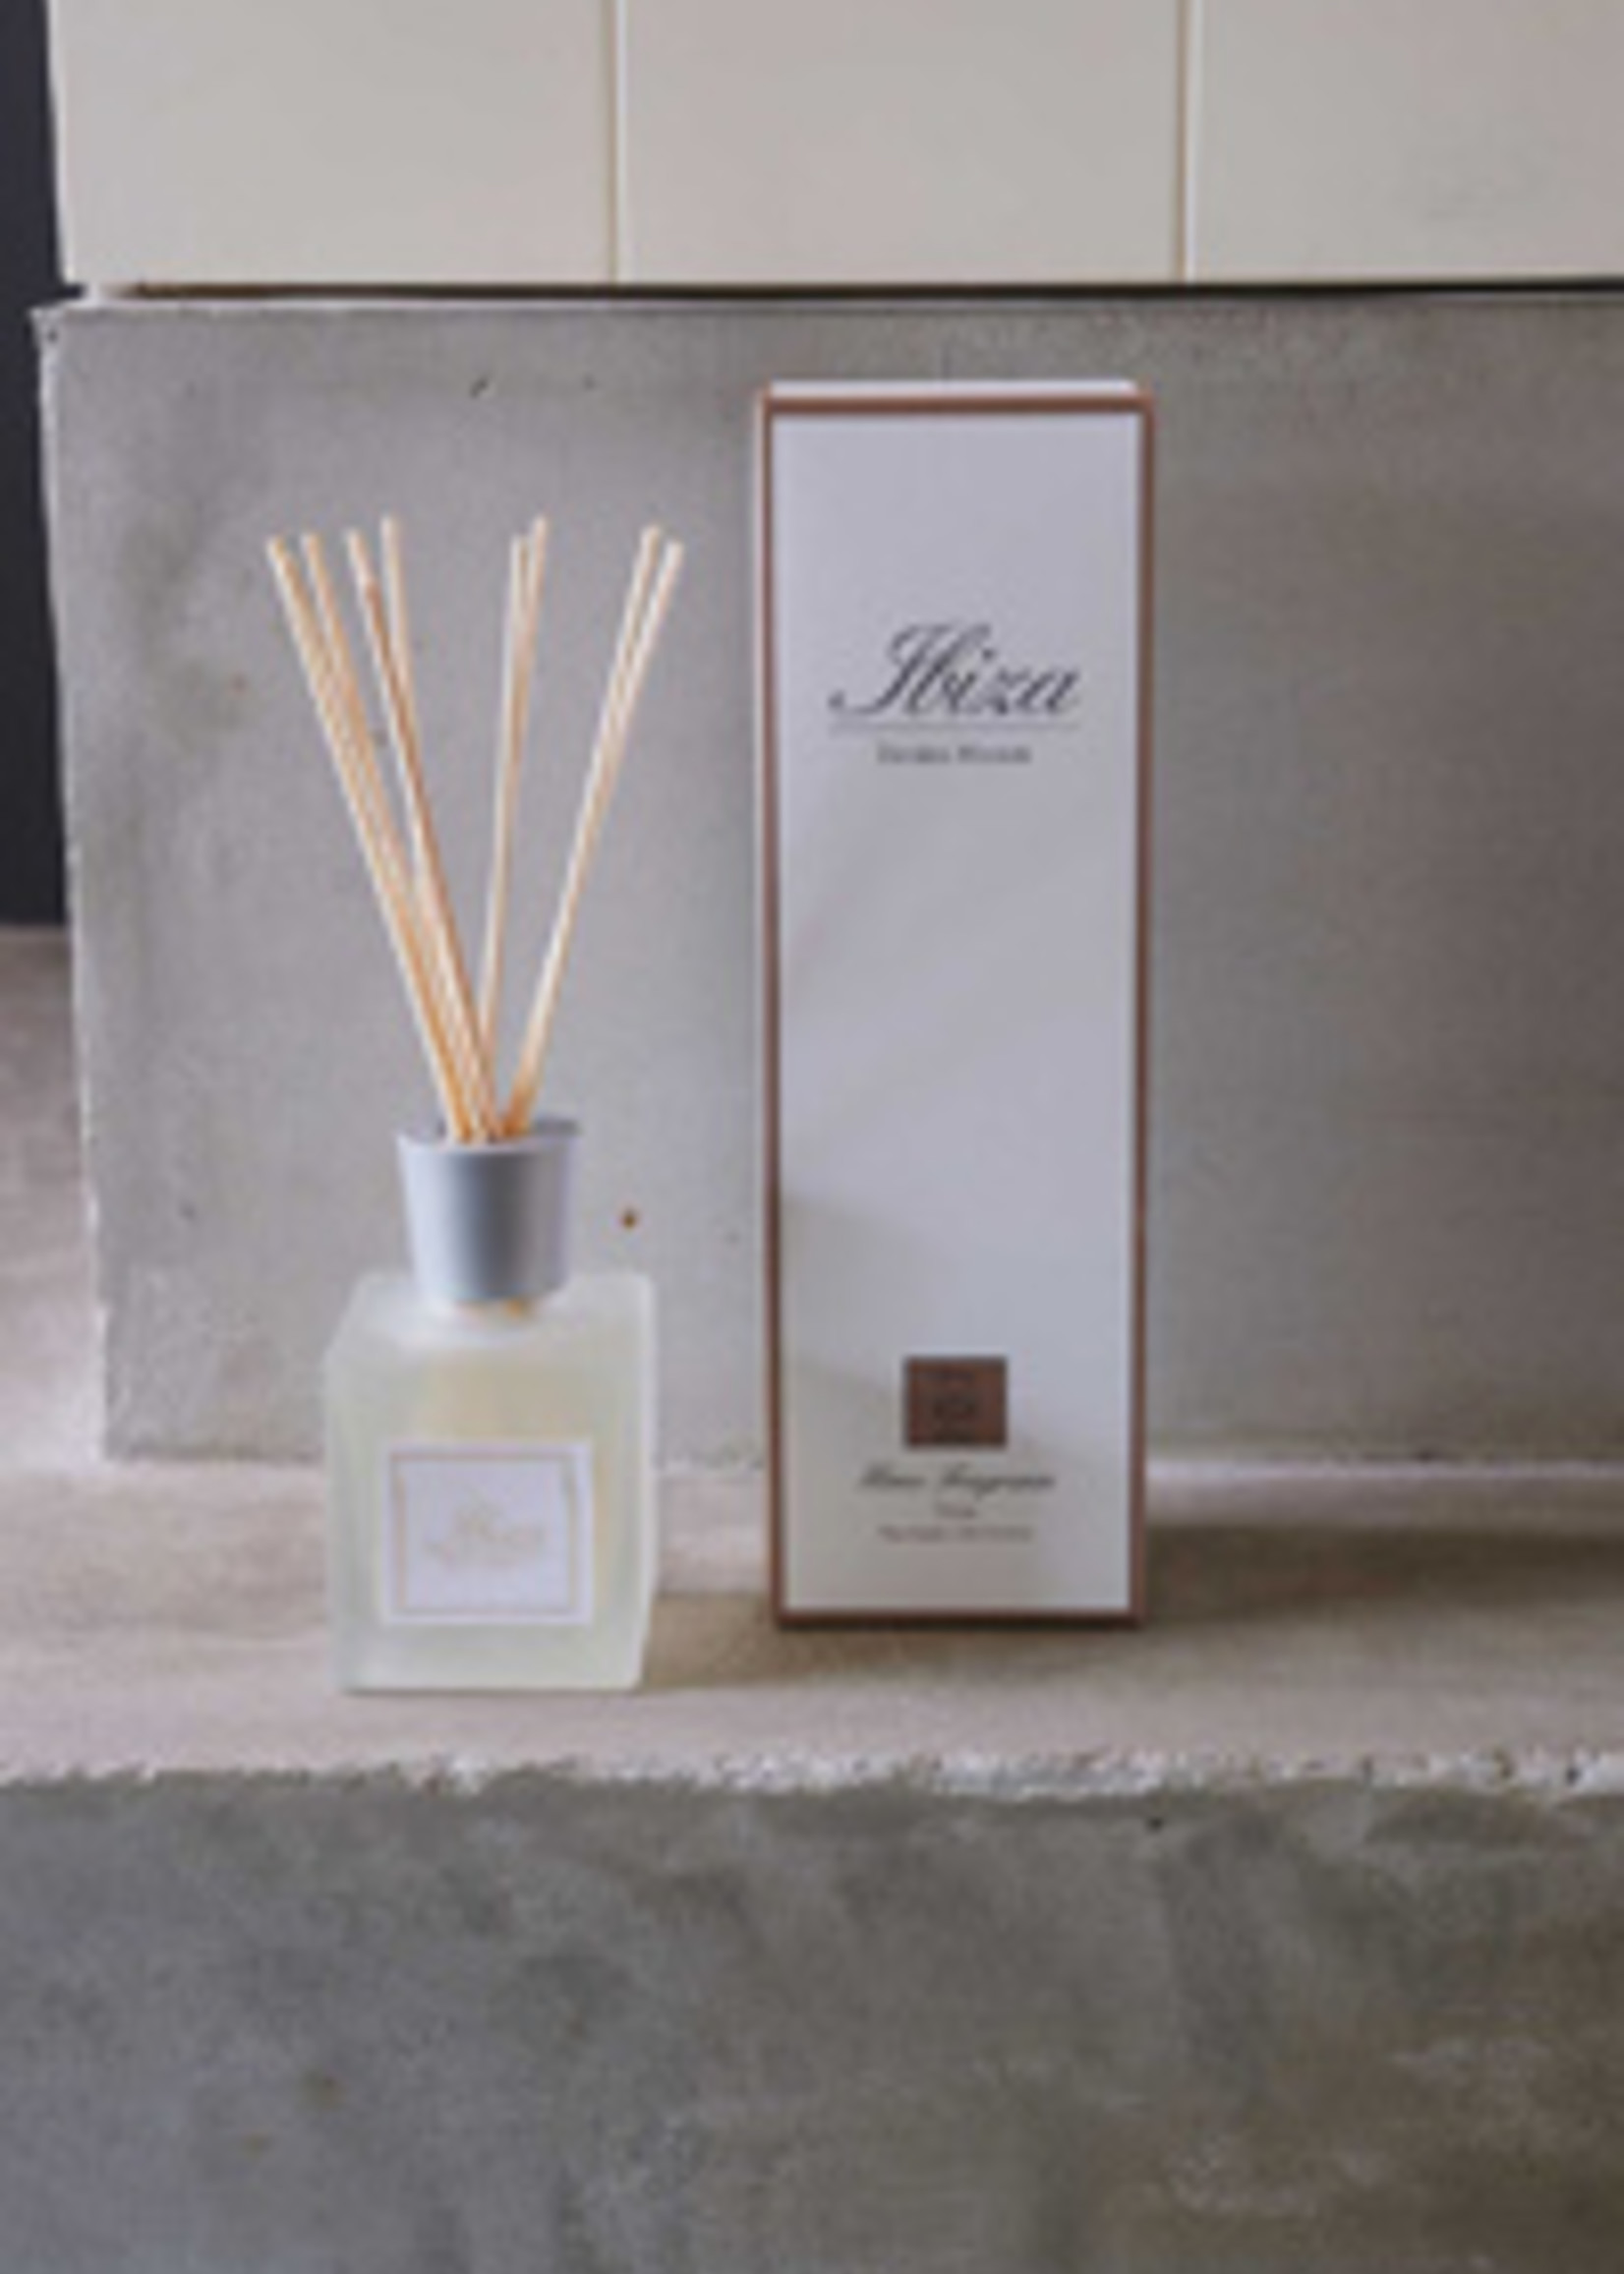 Riviera Maison Ibiza home fragrance